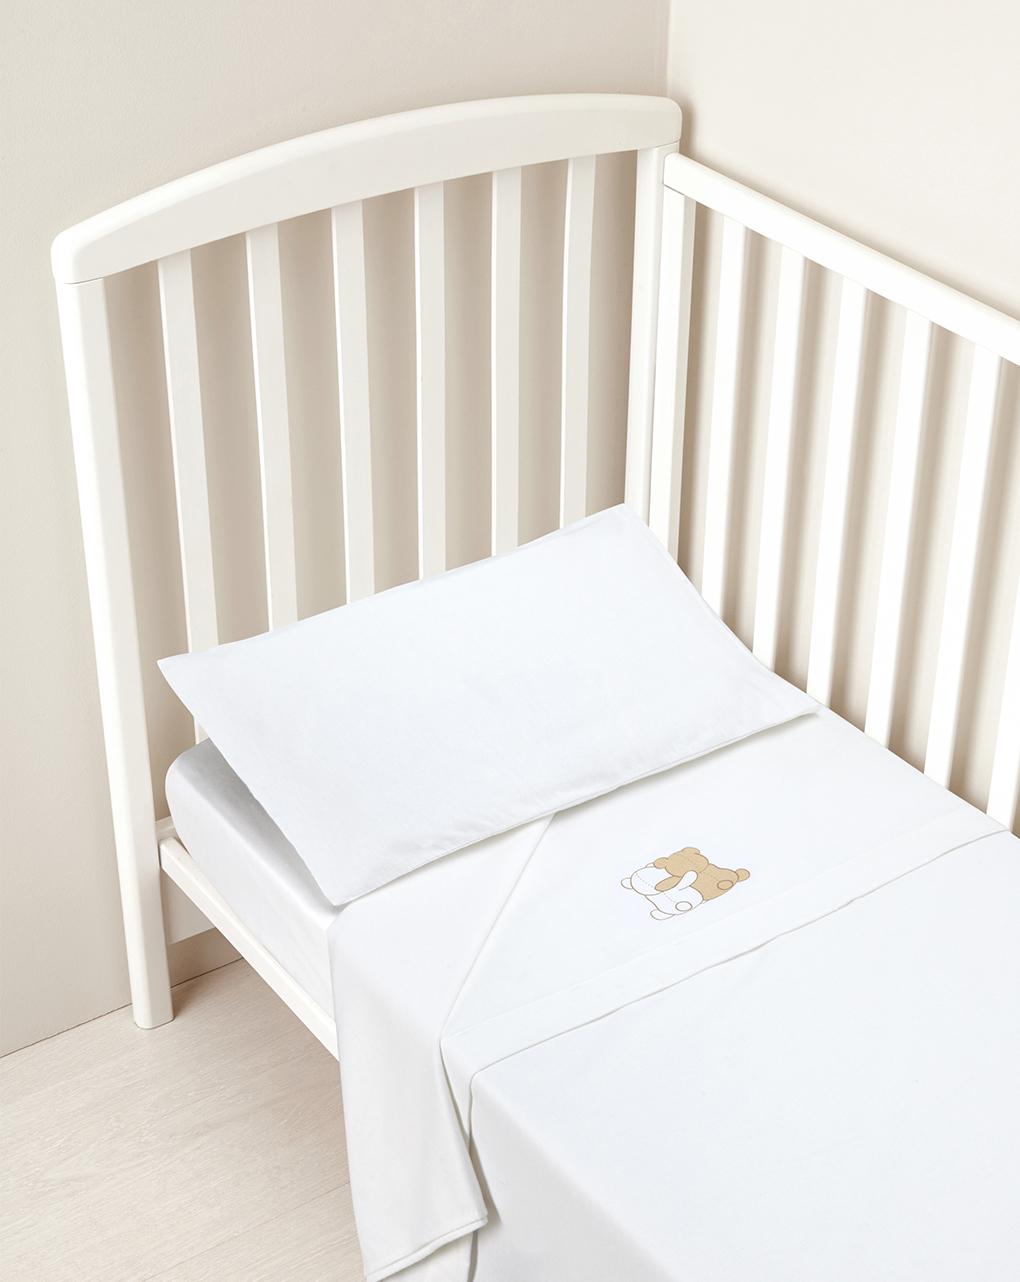 Prenatal Σετ για κρεβάτι Φανέλα 3 τεμ. Λευκό με Αρκουδάκι - 65 x 135 cm